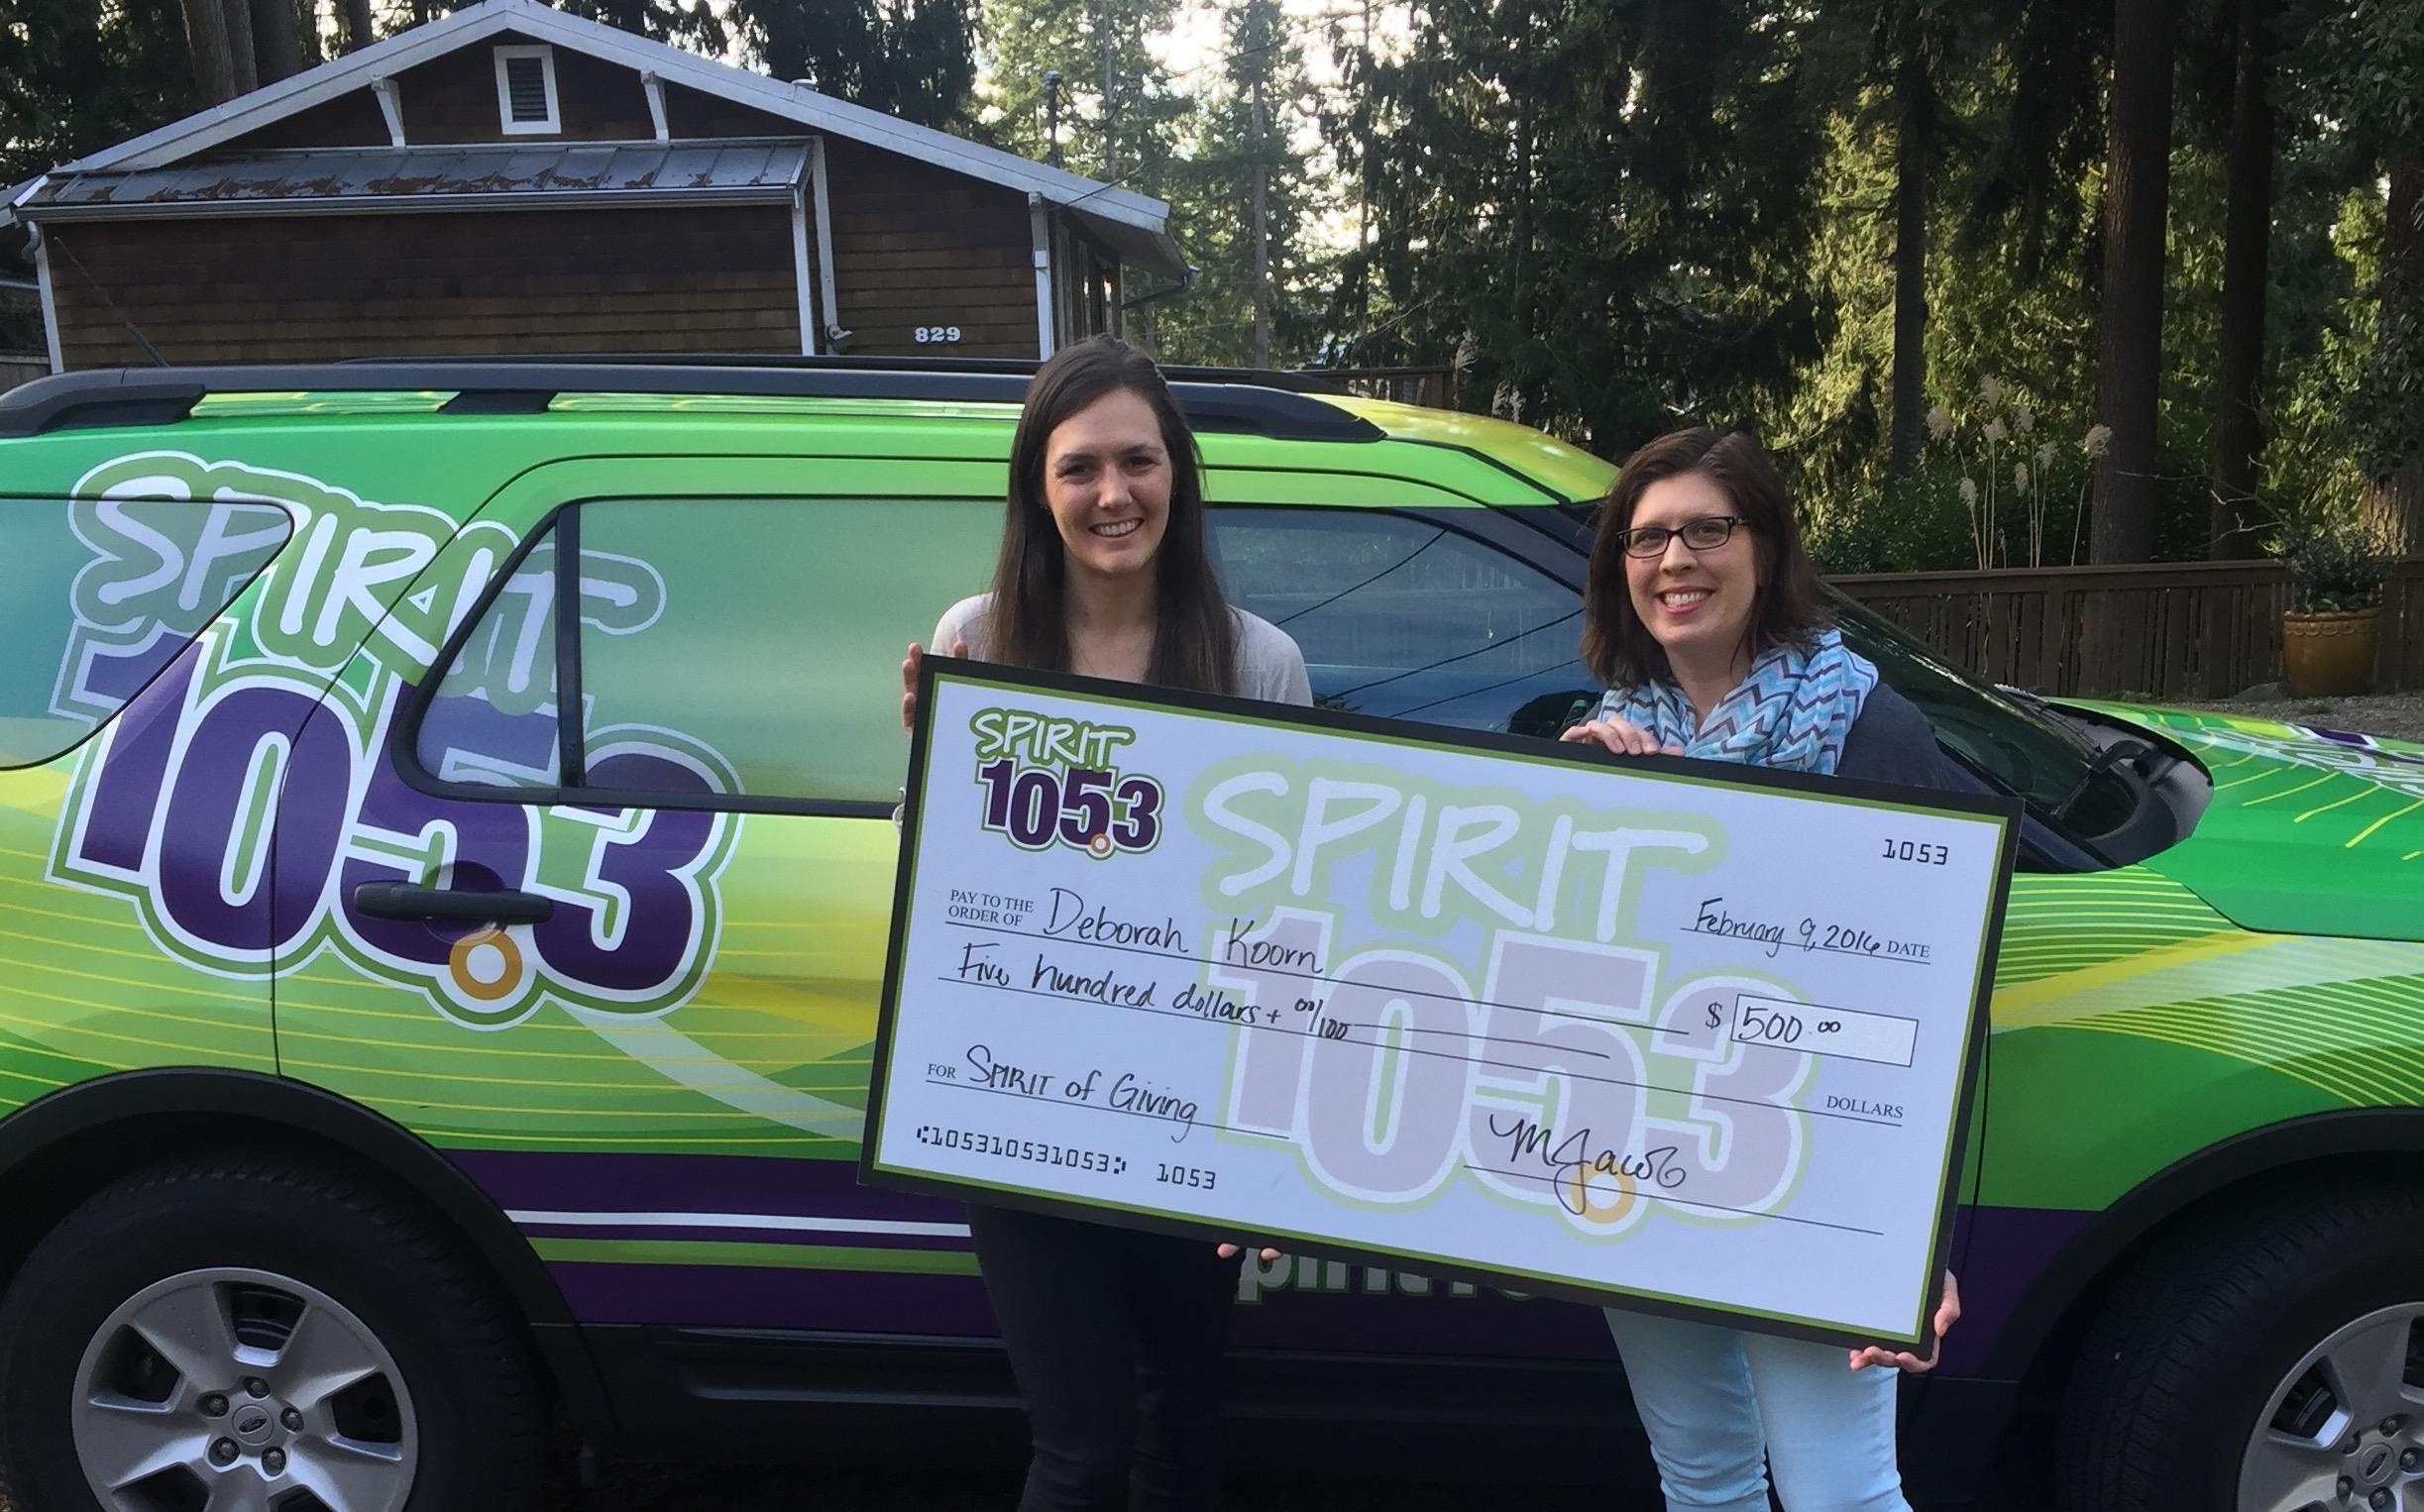 SPIRIT of Giving Winner: Deborah Koorn